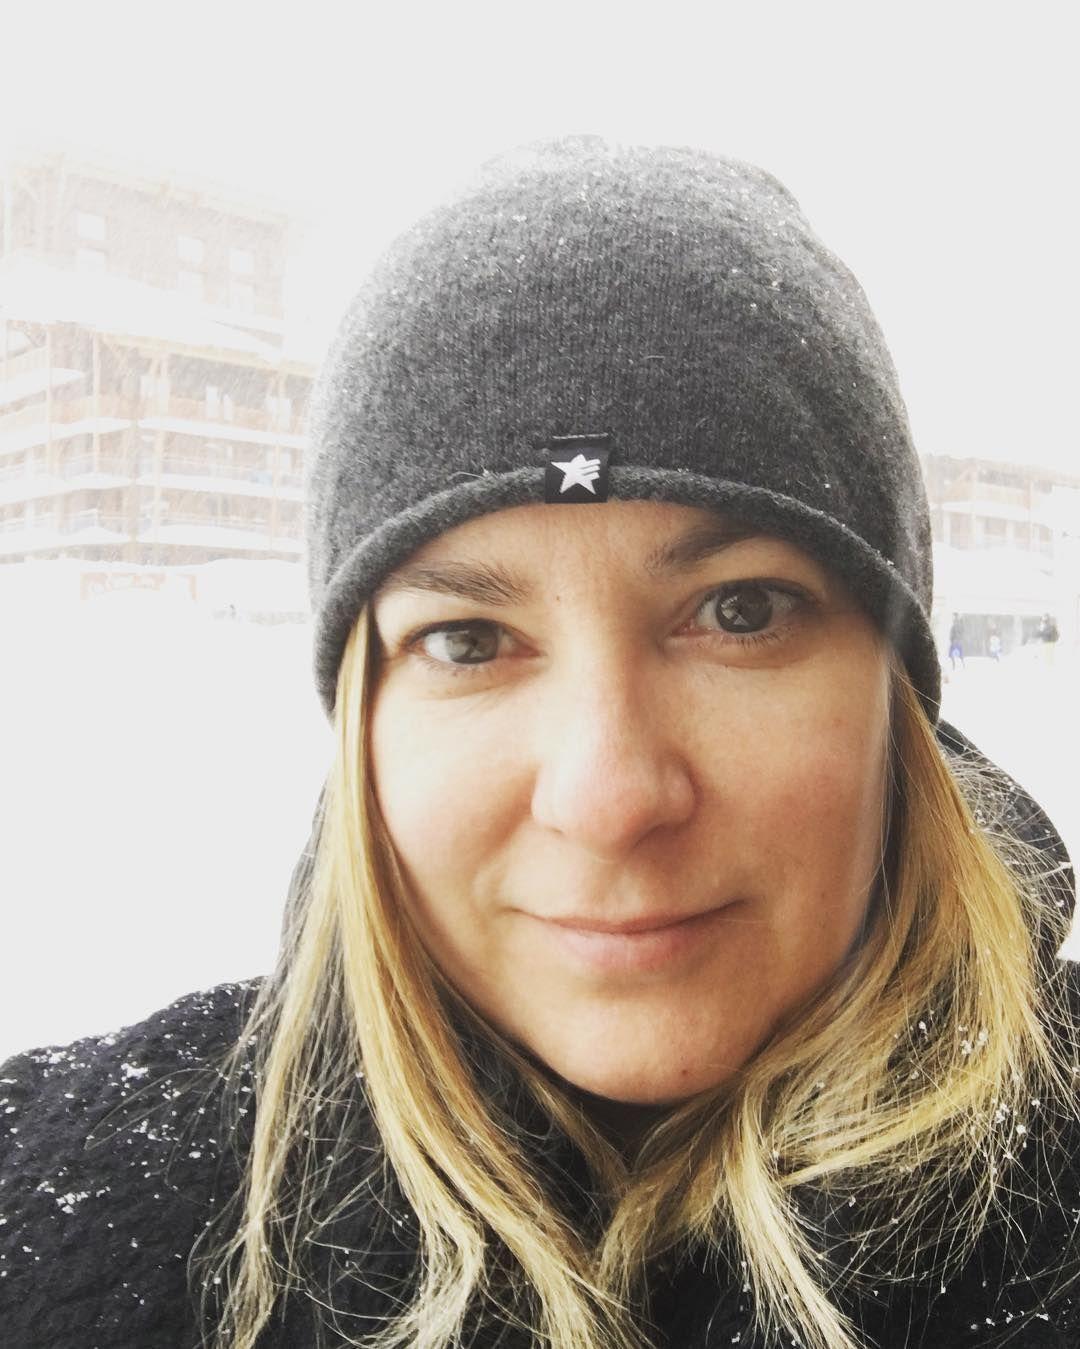 It's snowing! #france #selfie #thealps #junglistskimandem #snowboard #ski #skiingholiday #snow #holiday #travel #me #snowing #lesarcs